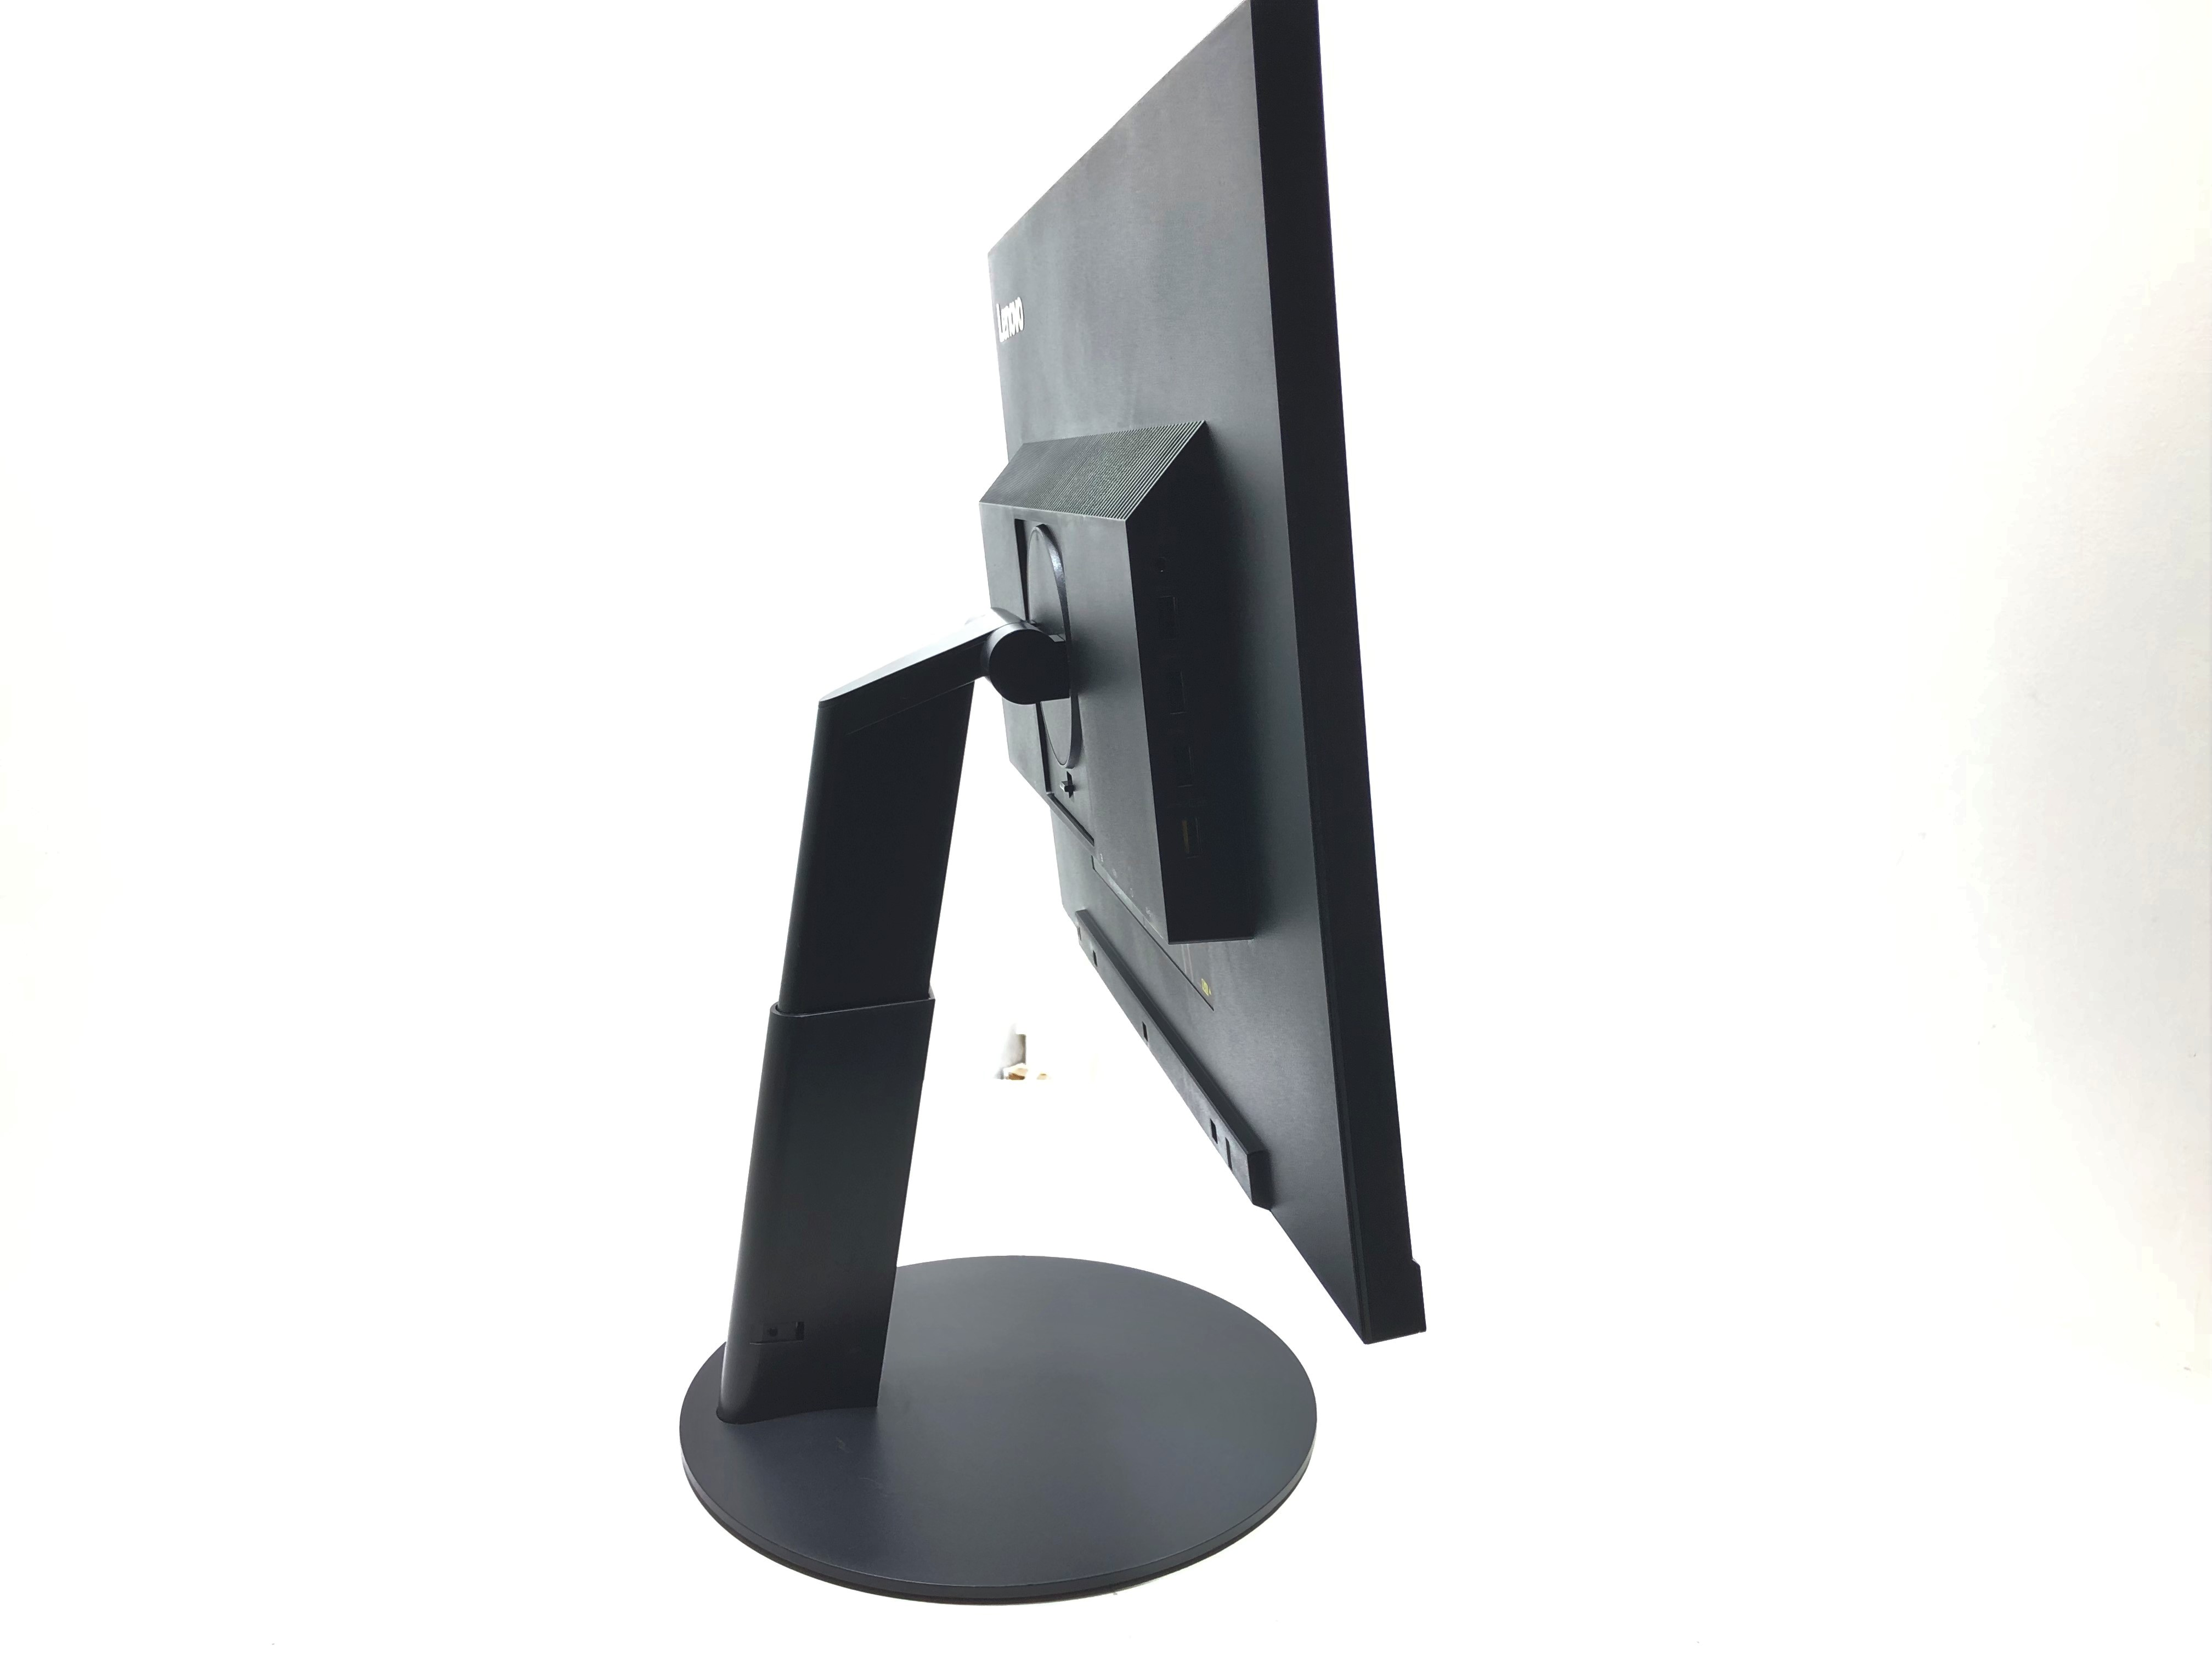 Lenovo ThinkVision T24d-10 No 3